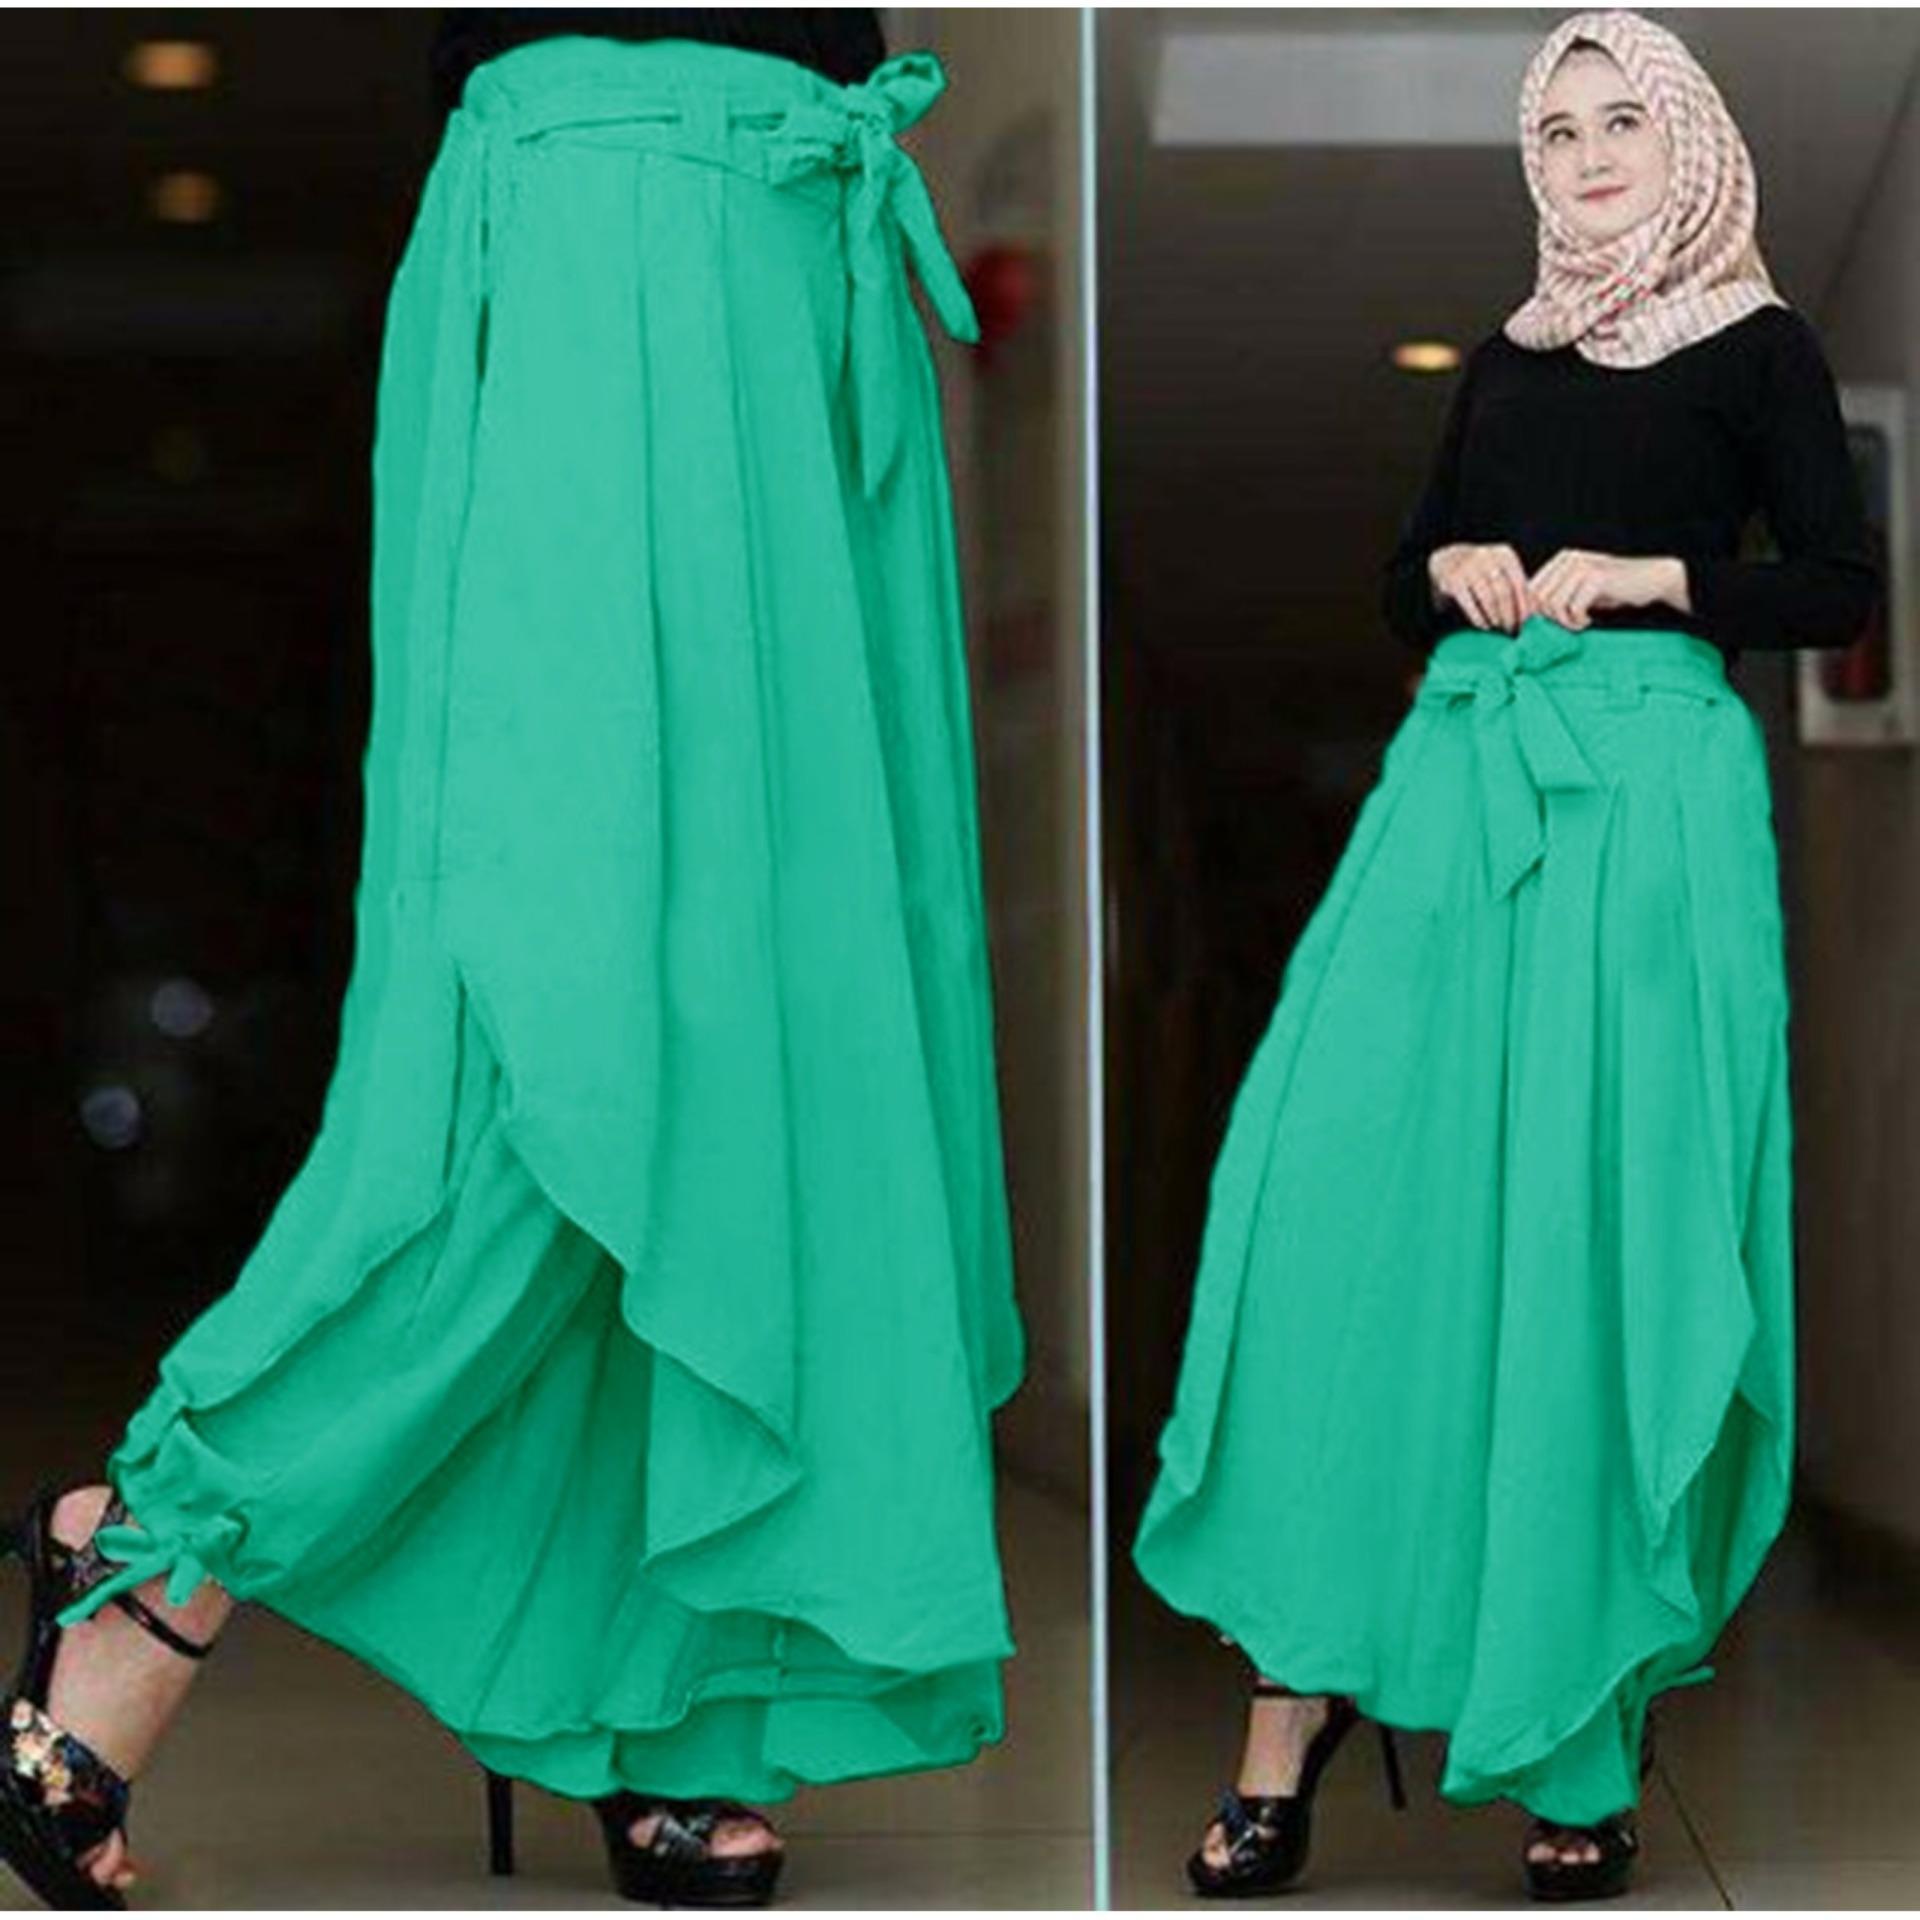 Flavia Store Celana Panjang Wanita FS0146 TOSCA Kulot Rok Muslim Aladin Bawahan Muslimah